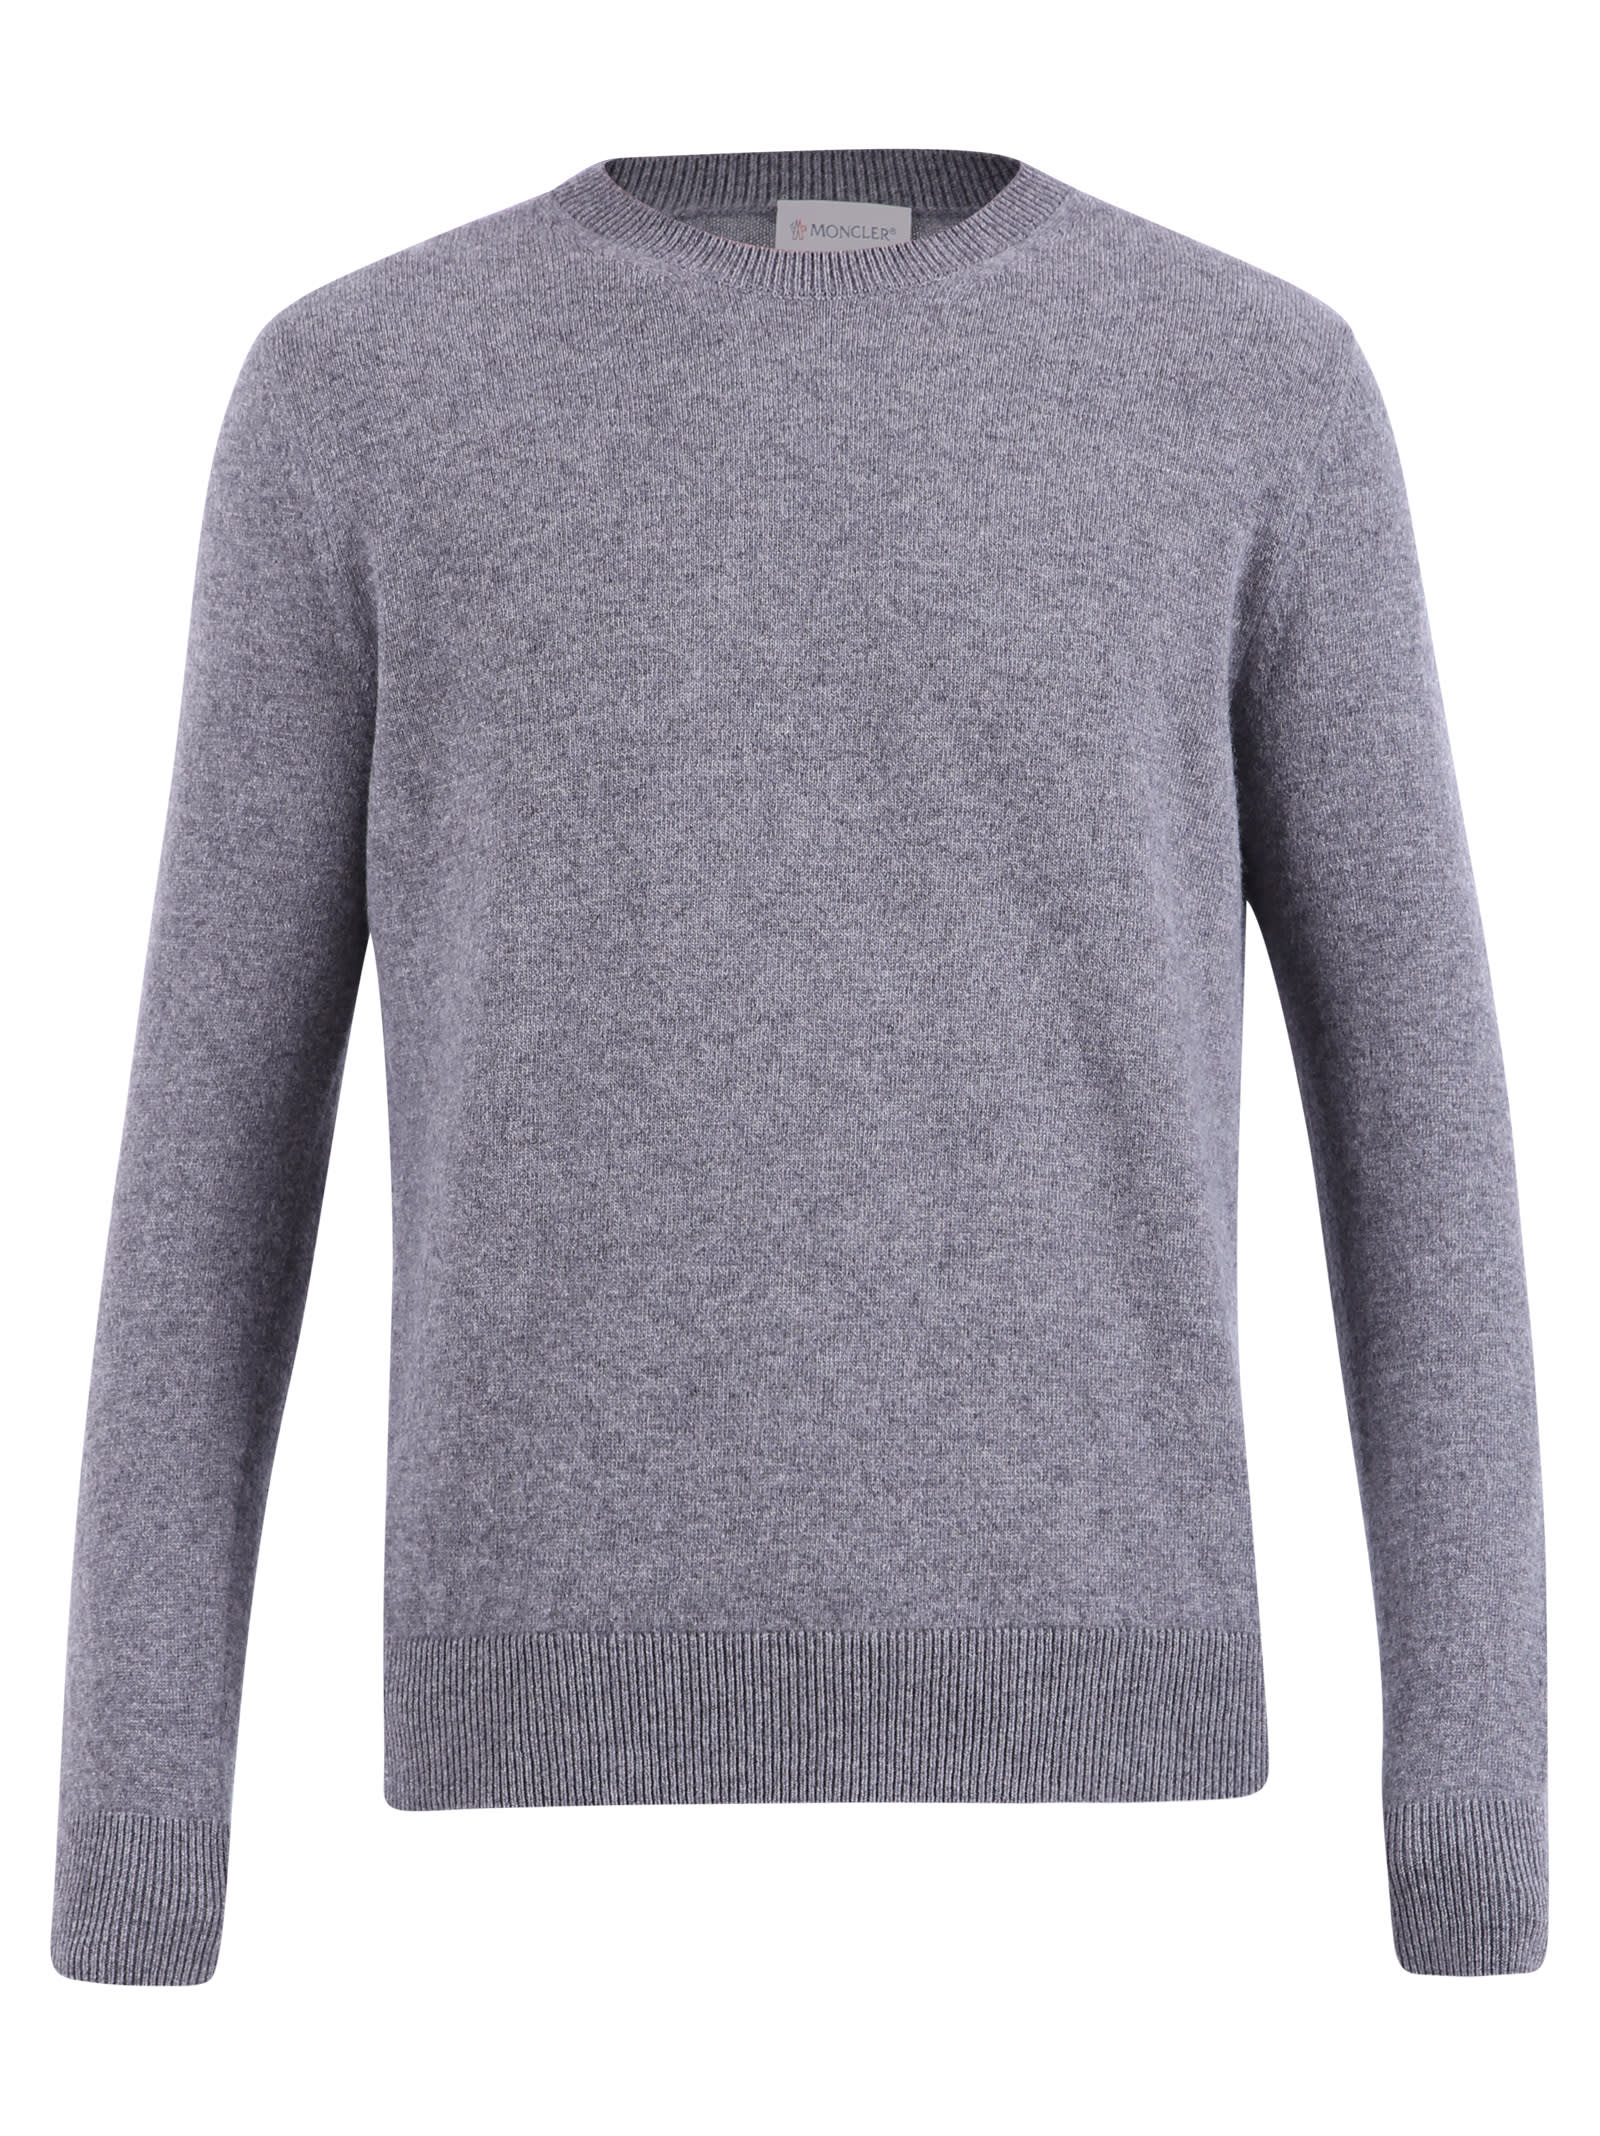 Moncler Grey Sweater